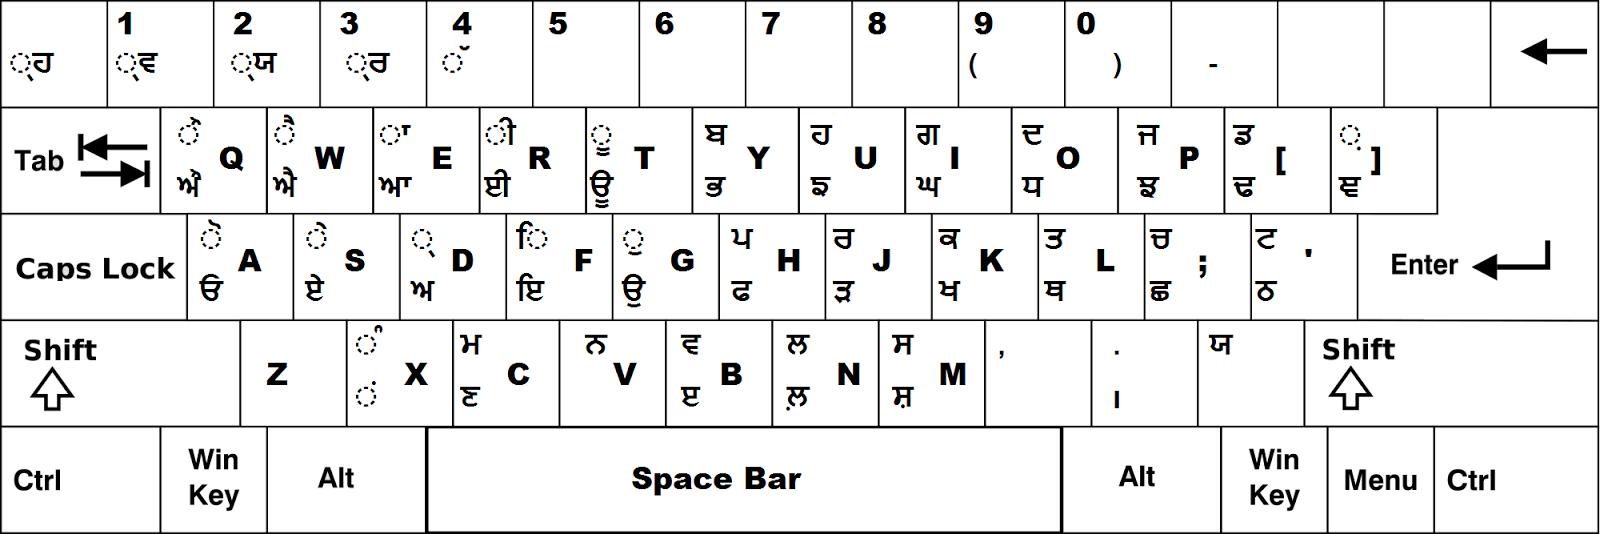 ravi font keyboard Google Search in 2020 Downloadable